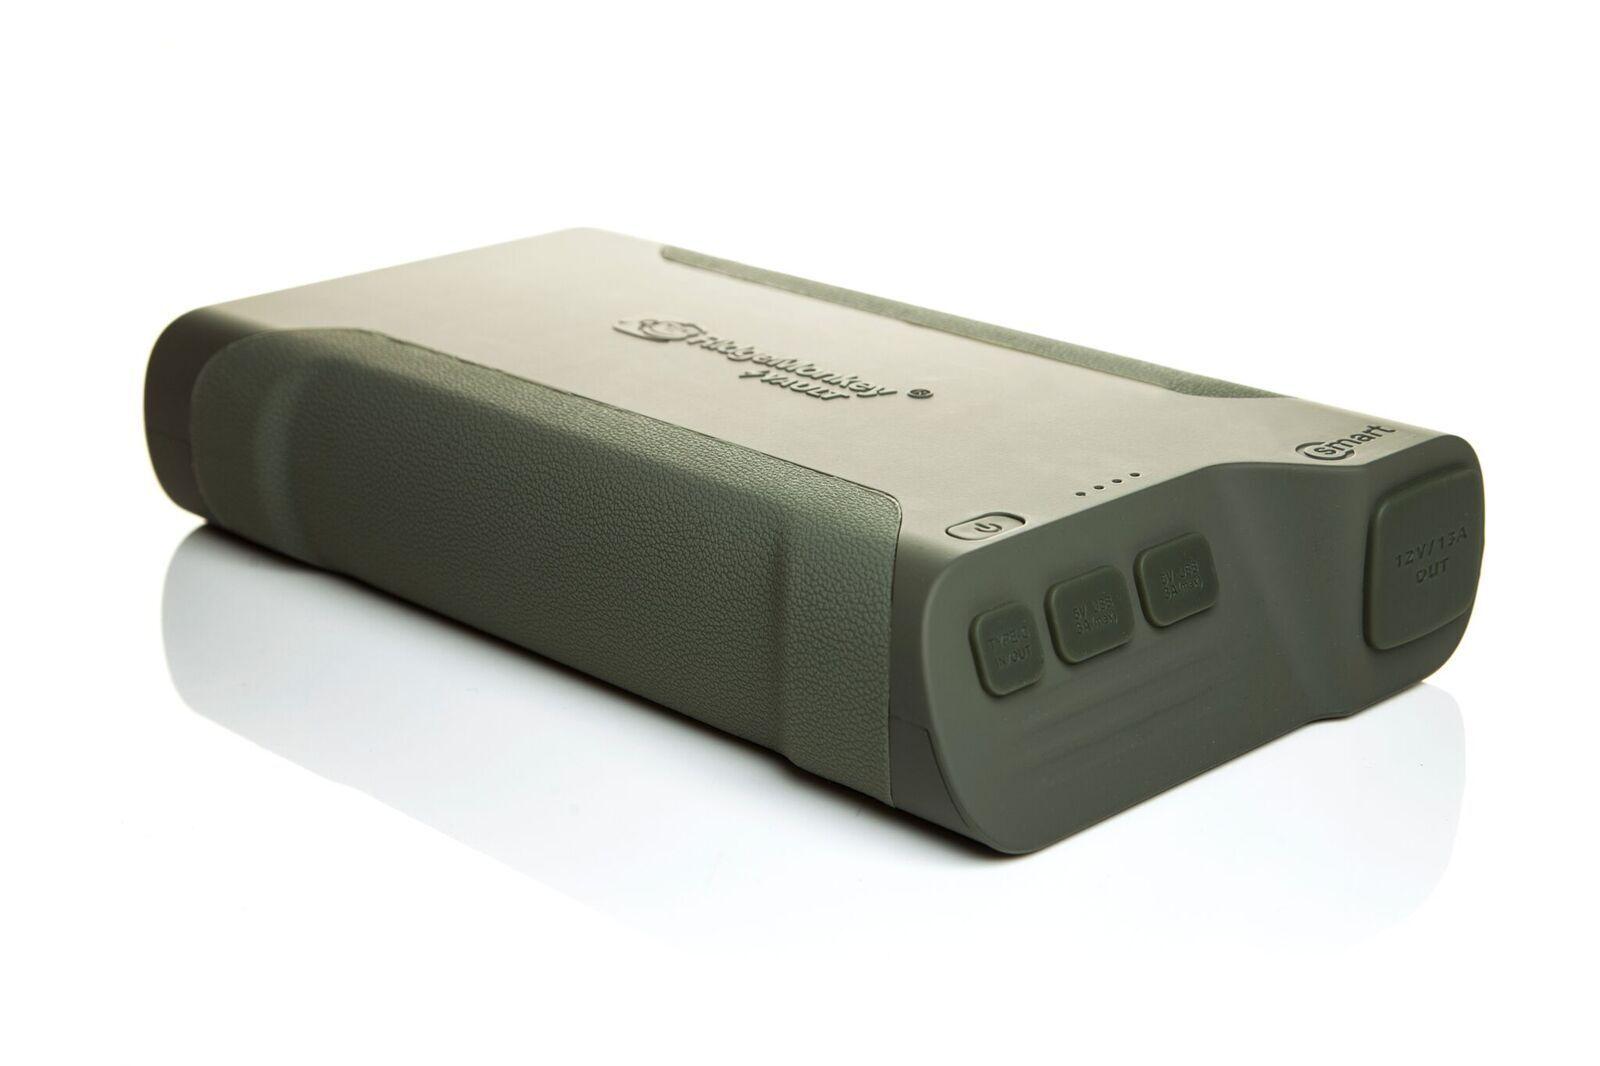 Ridgemonkey Vault C-Smart New- 42150mAh Gunmetal Grün Powerbank New- C-Smart Free Delivery b5e87f